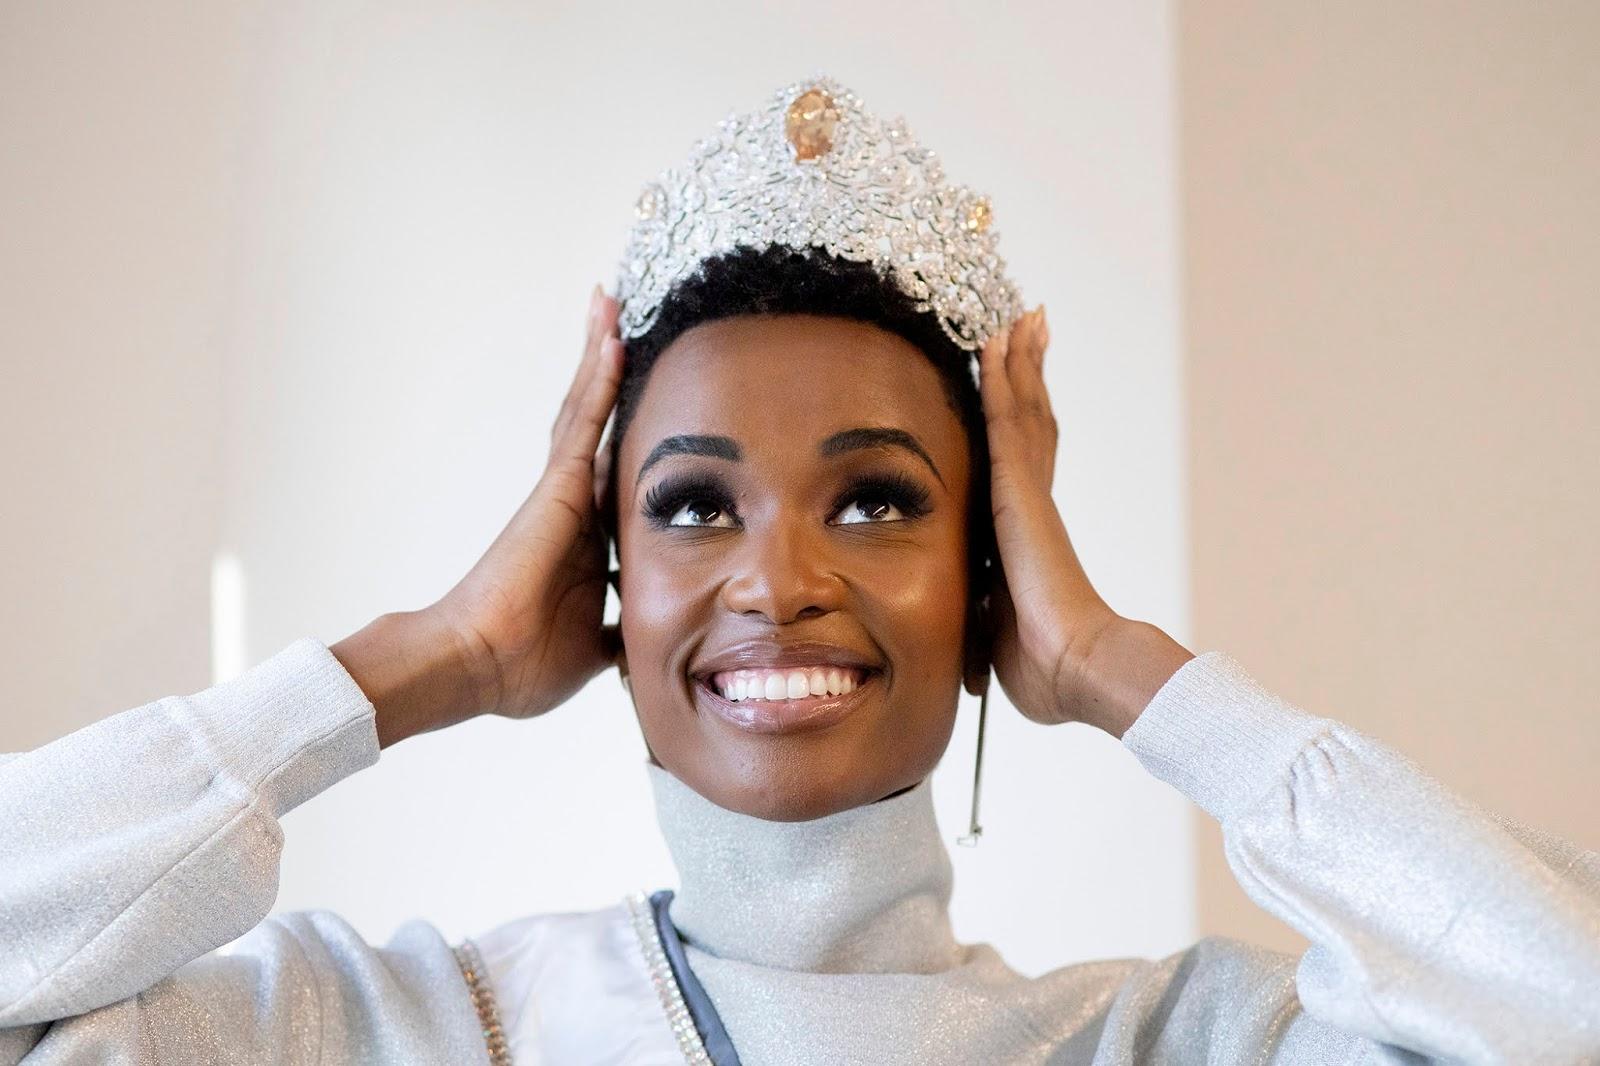 Miss Universe Zozibini Tunzi Tells CNN She Has Been Missing South Africa During New York Lockdown